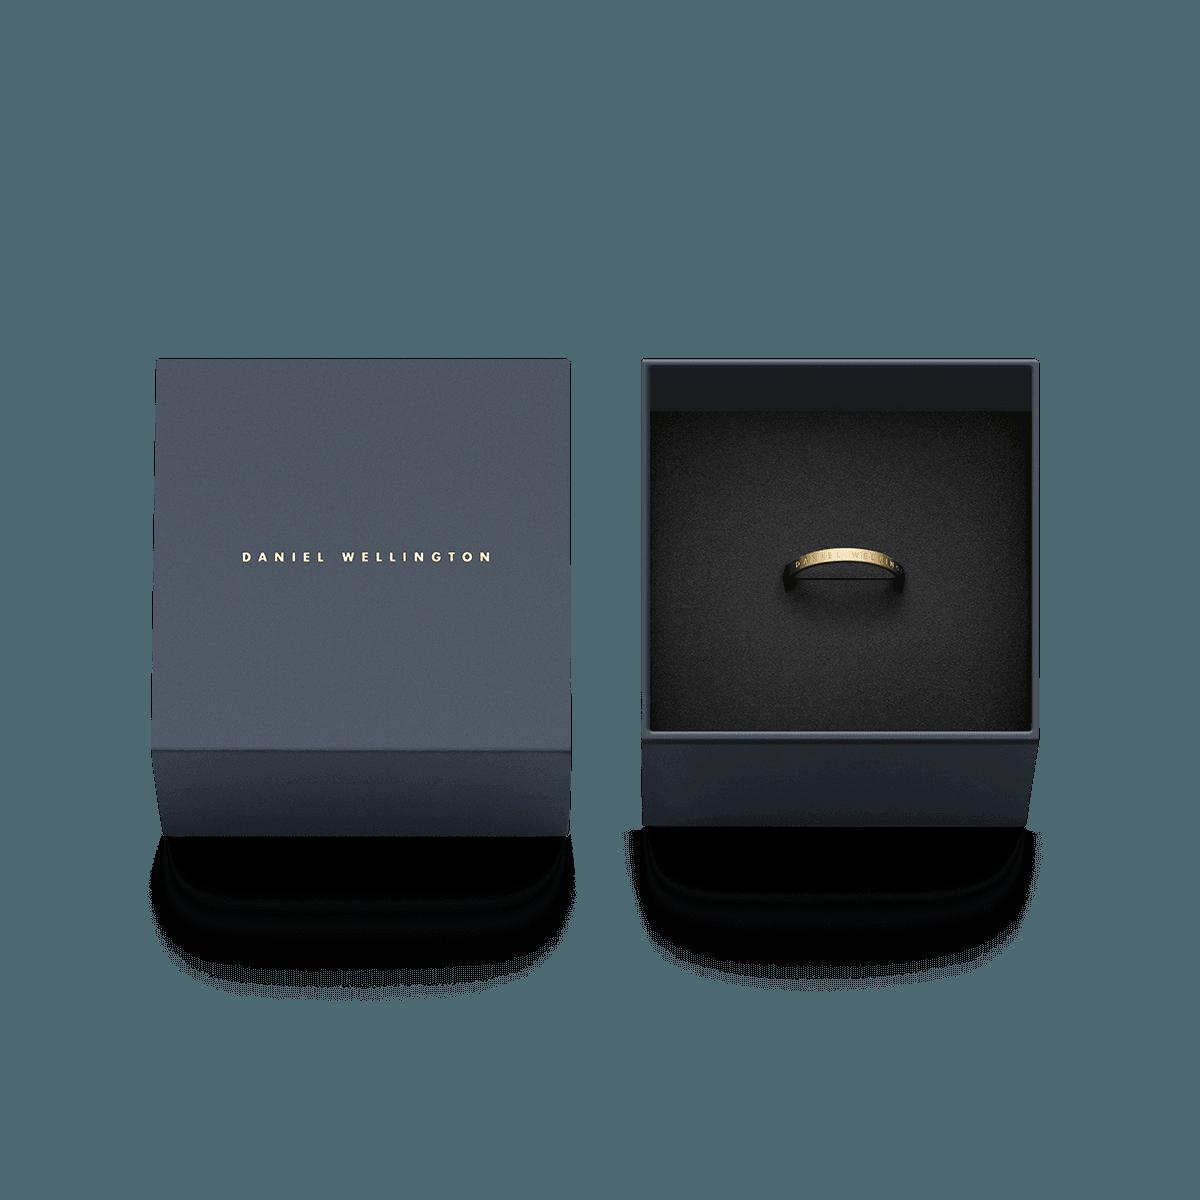 dw官网 dw手表官网 dw中国官网 dw官方旗舰店 DW DW官网  Classic Ring Gold 70 mm